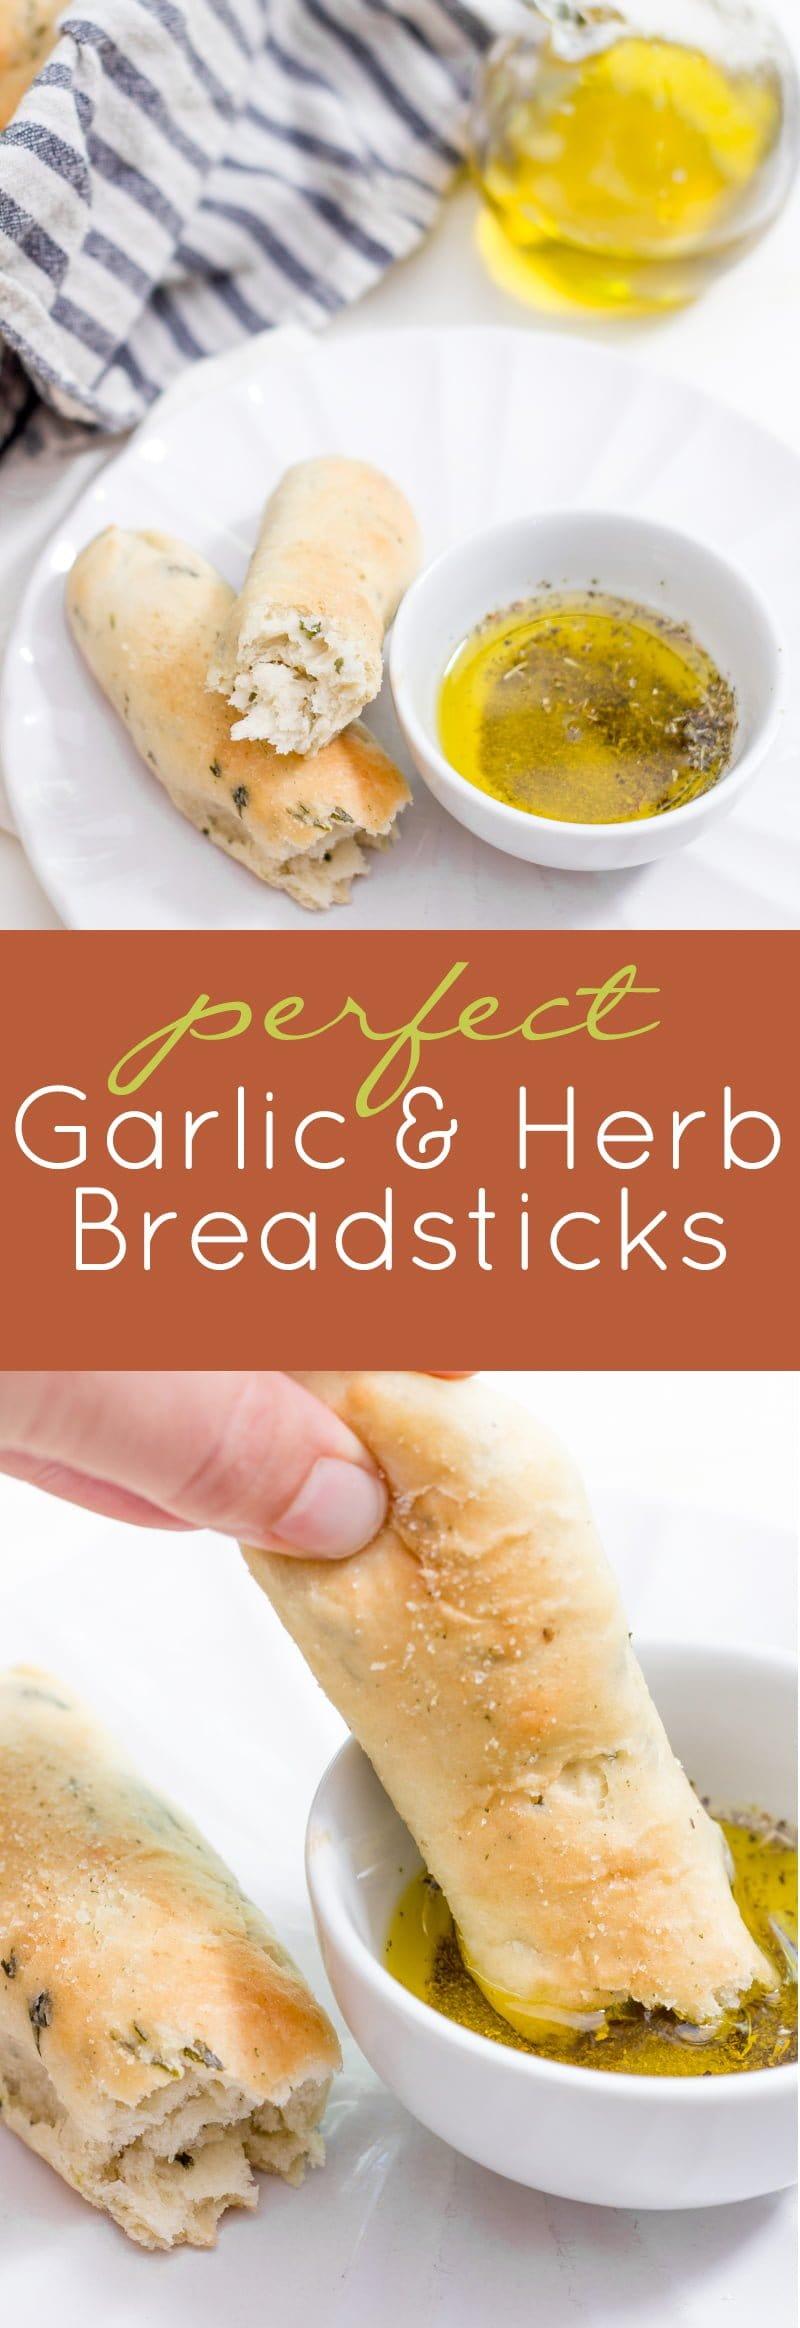 Garlic & Herb Breadsticks